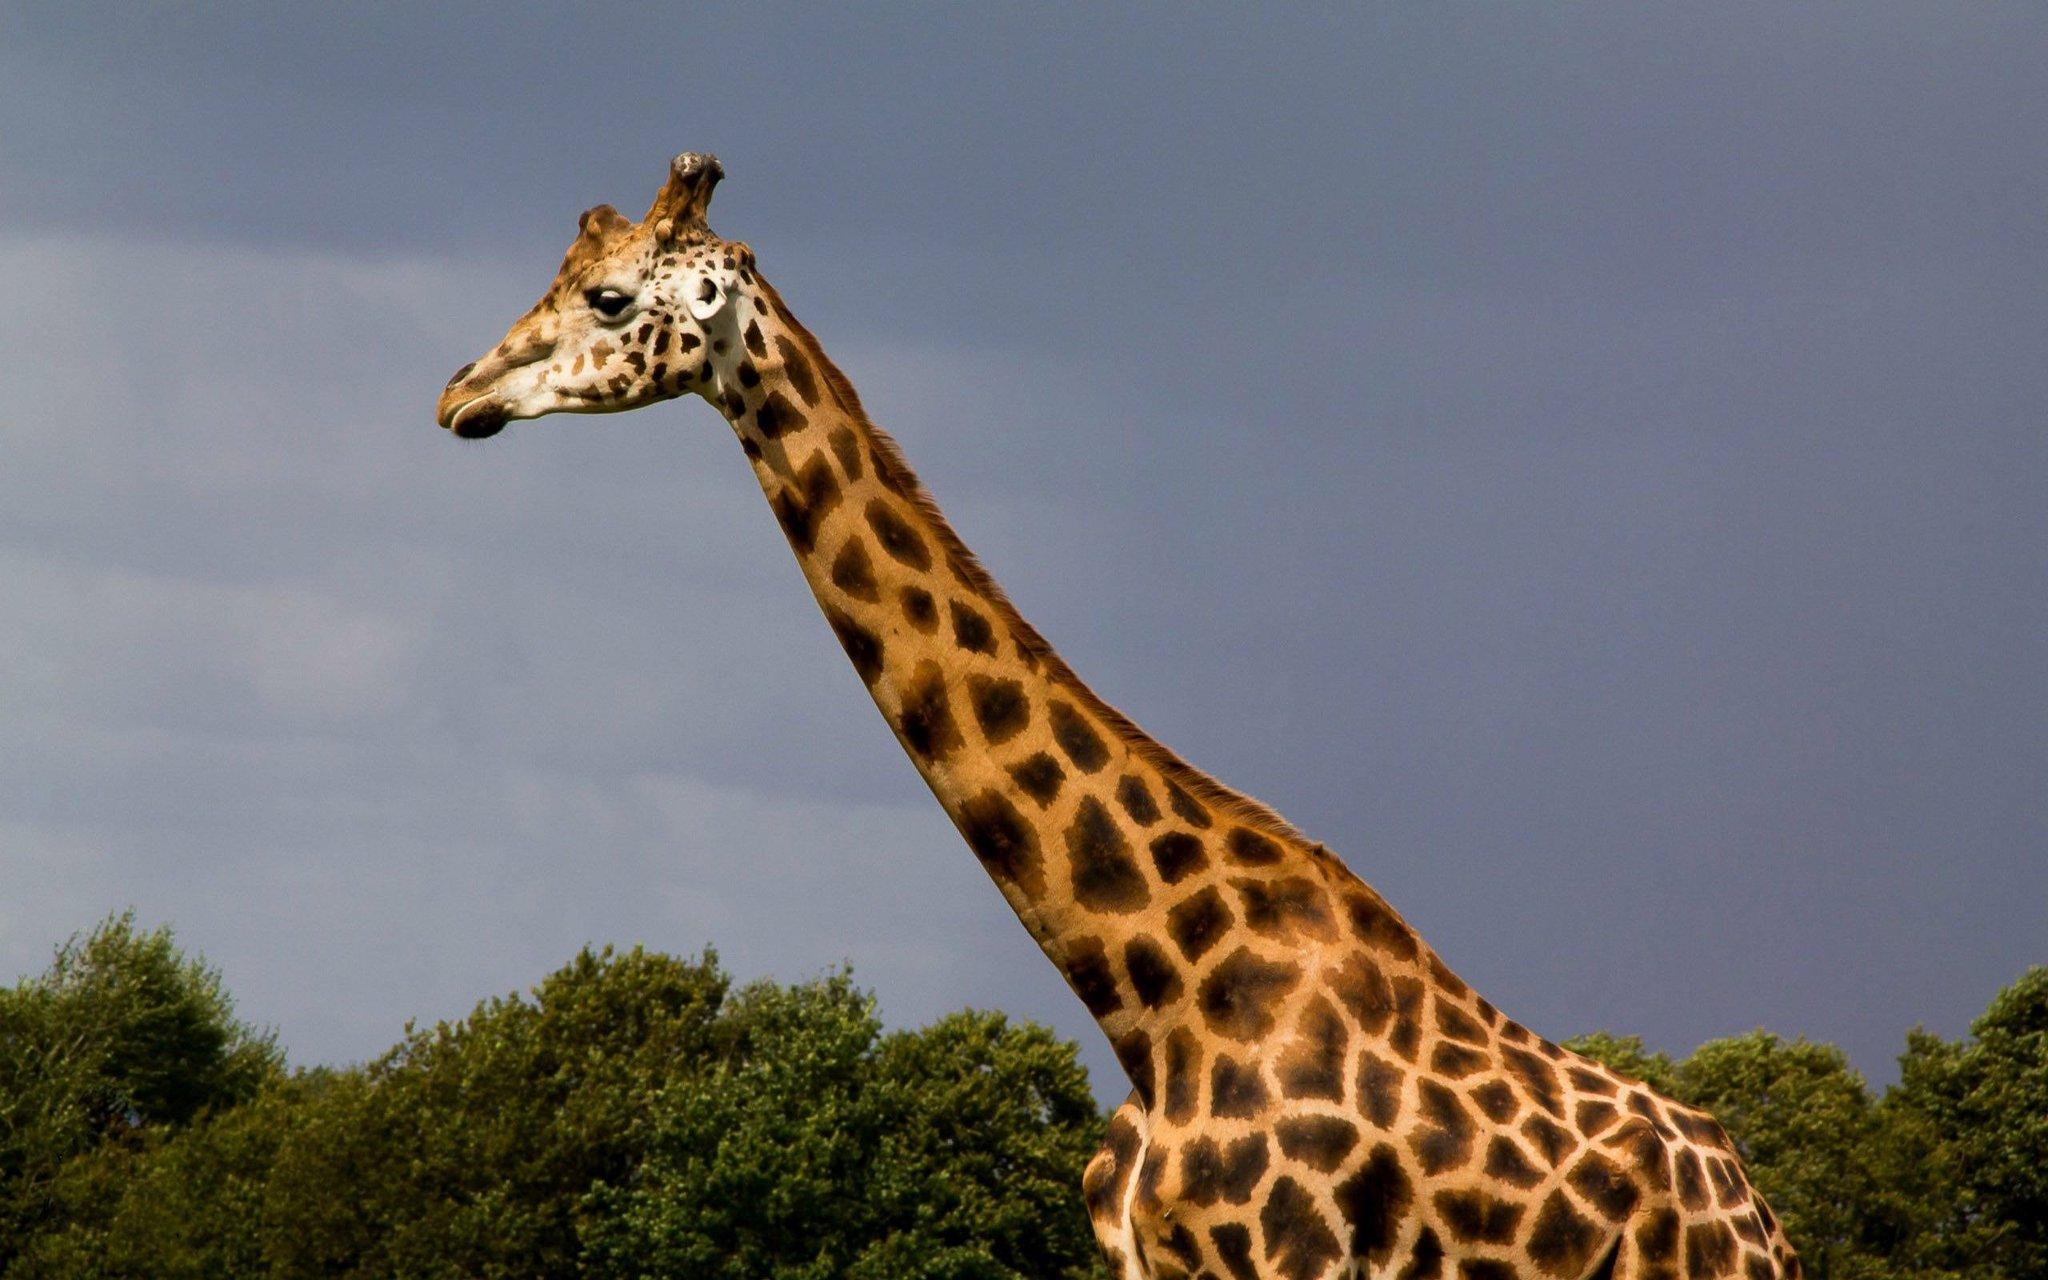 Картинки жирафов настоящих, утро